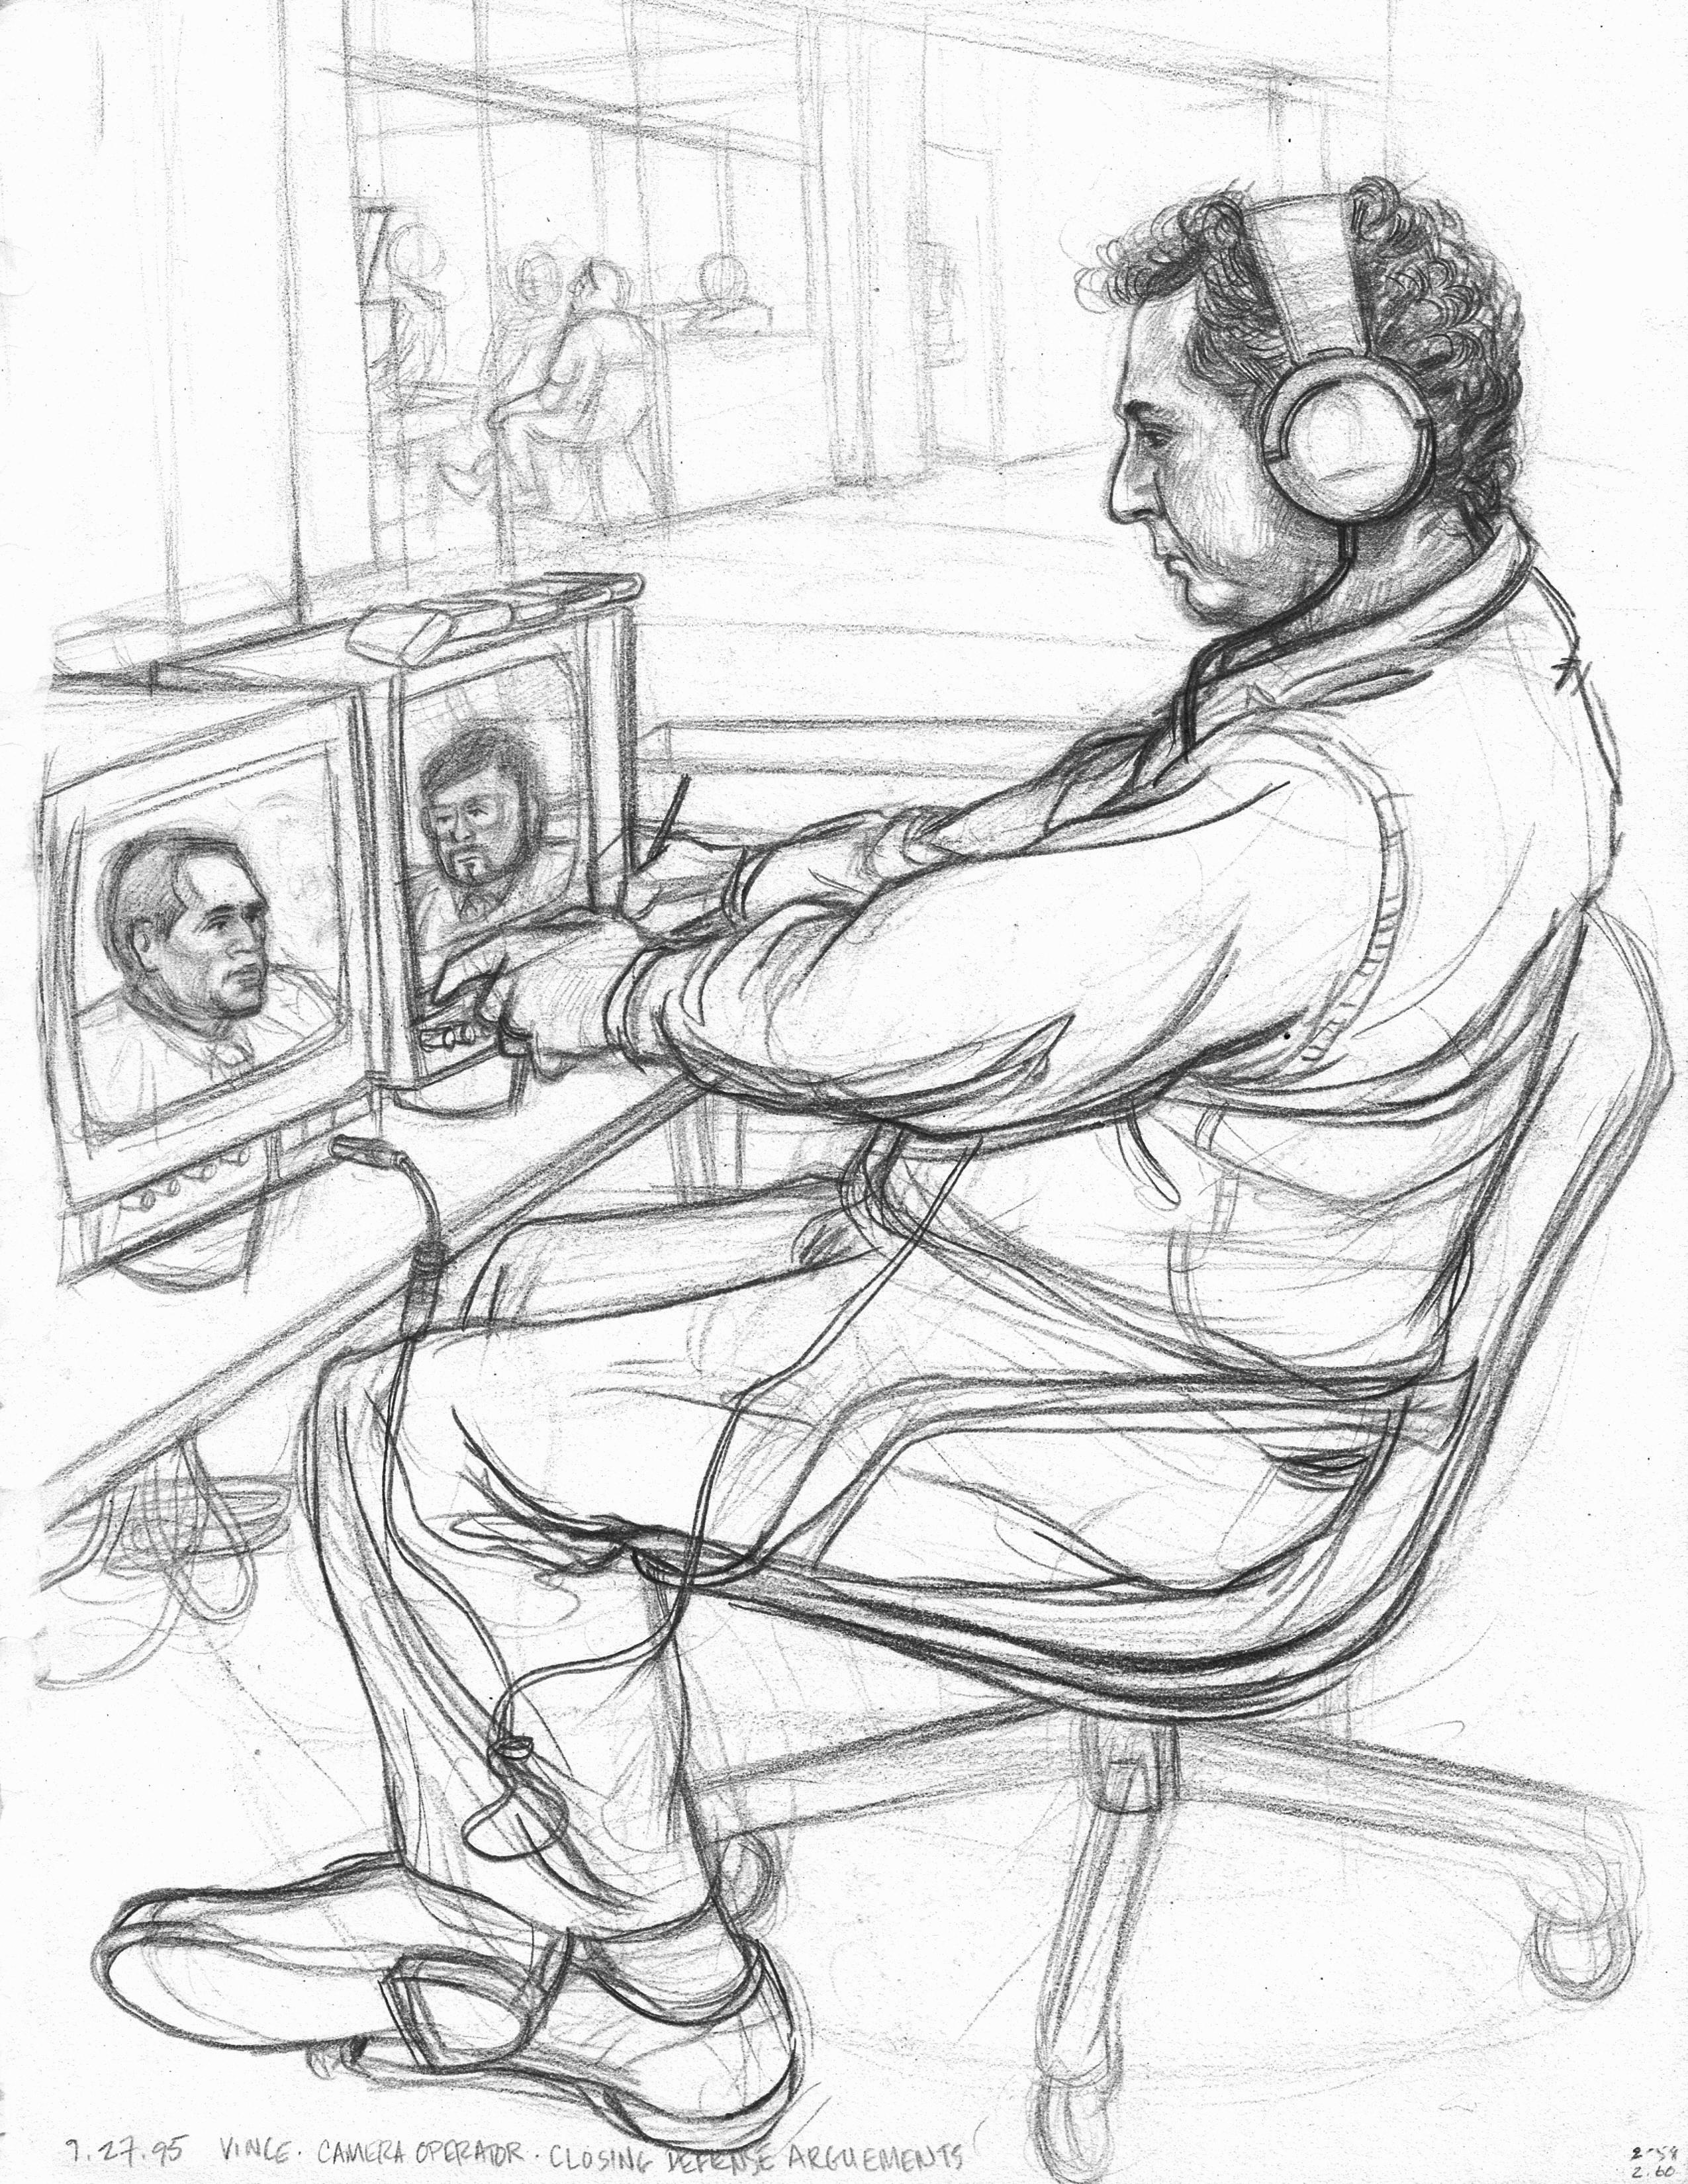 Vince - Hallway TV Operator BW